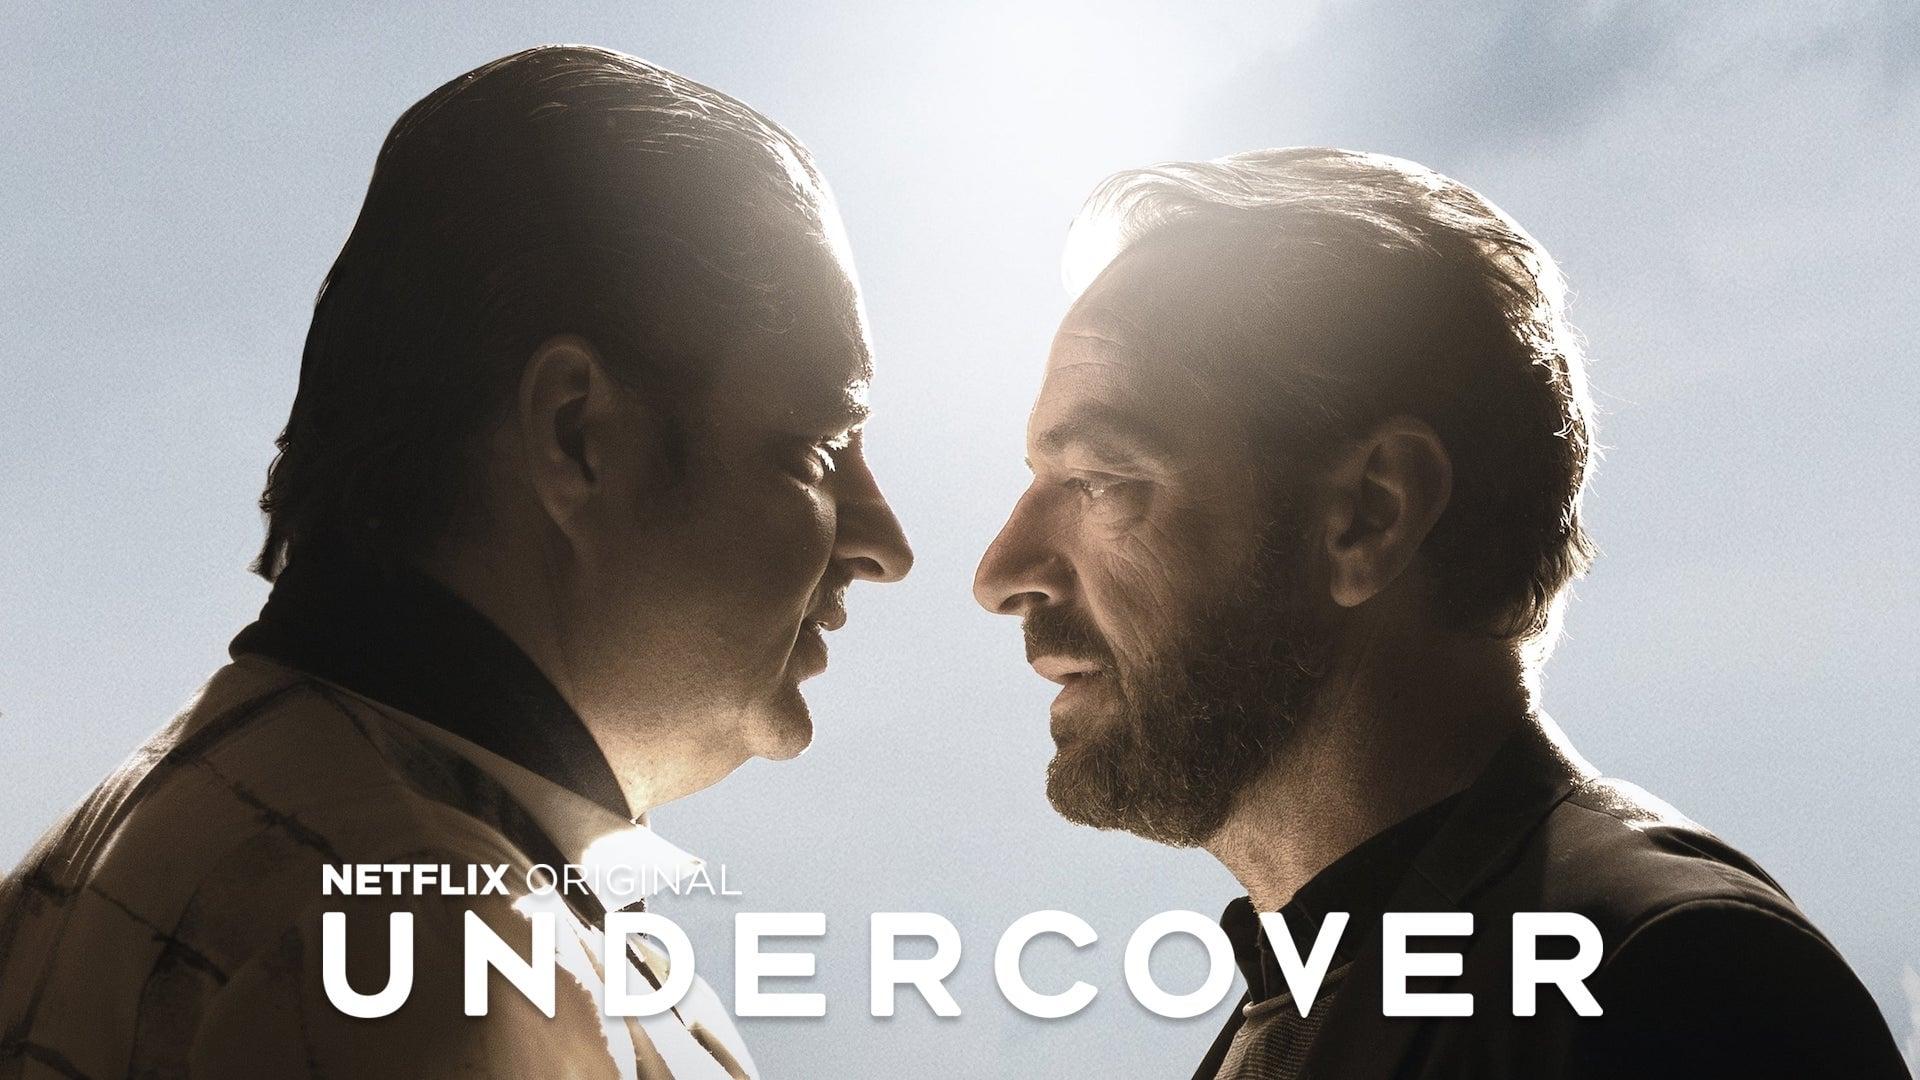 Undercover Season 2 Episode 1 on 'Netflix'